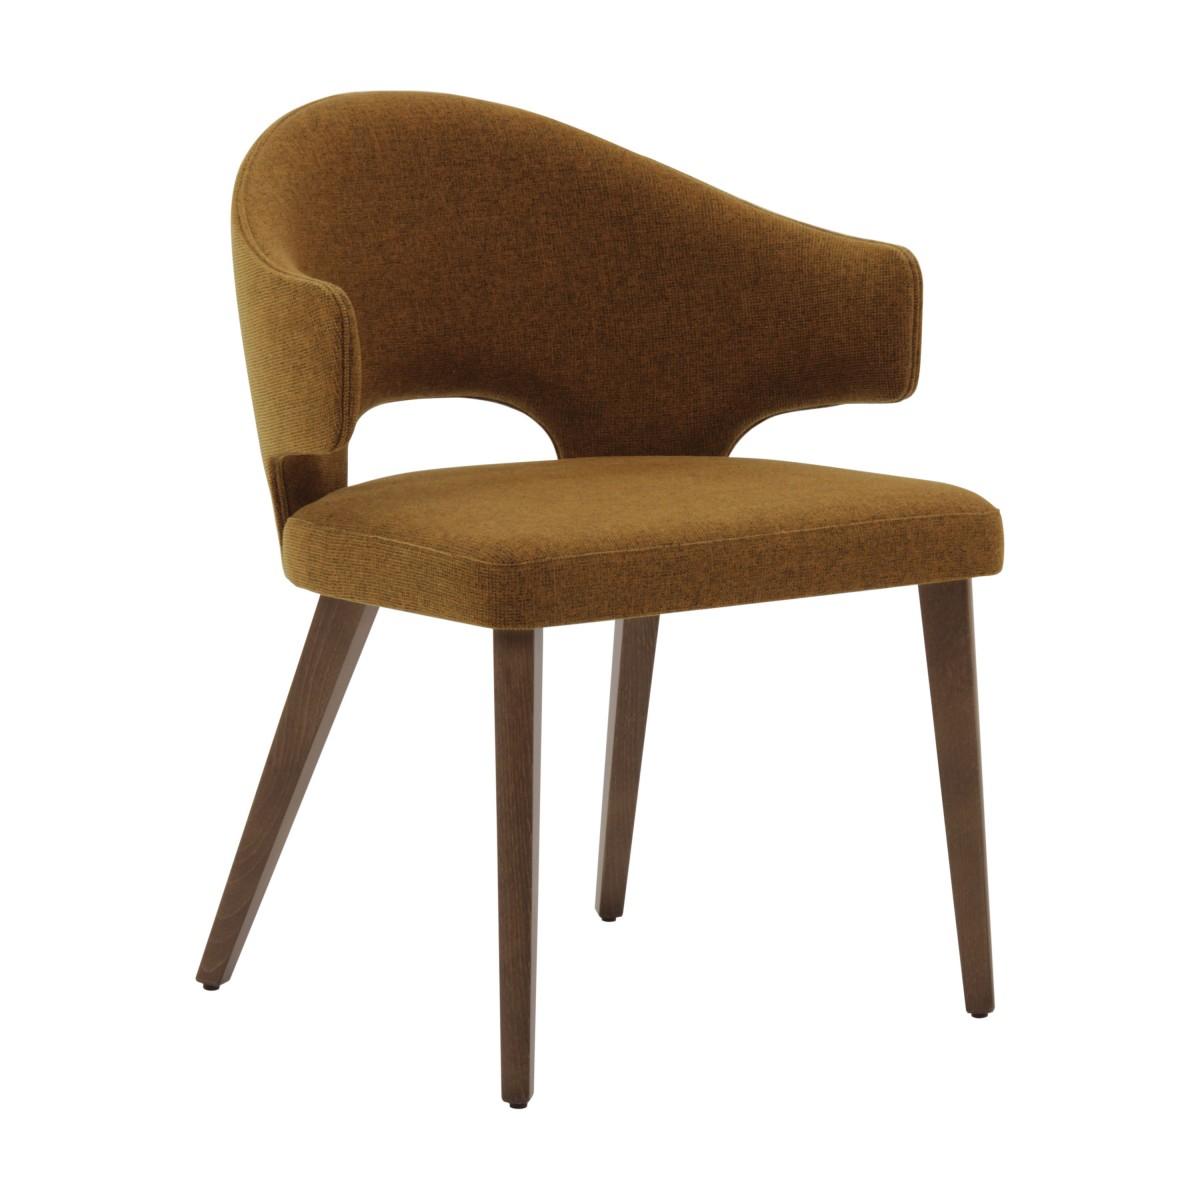 contemporary italian wood yellow armchair eva 6870